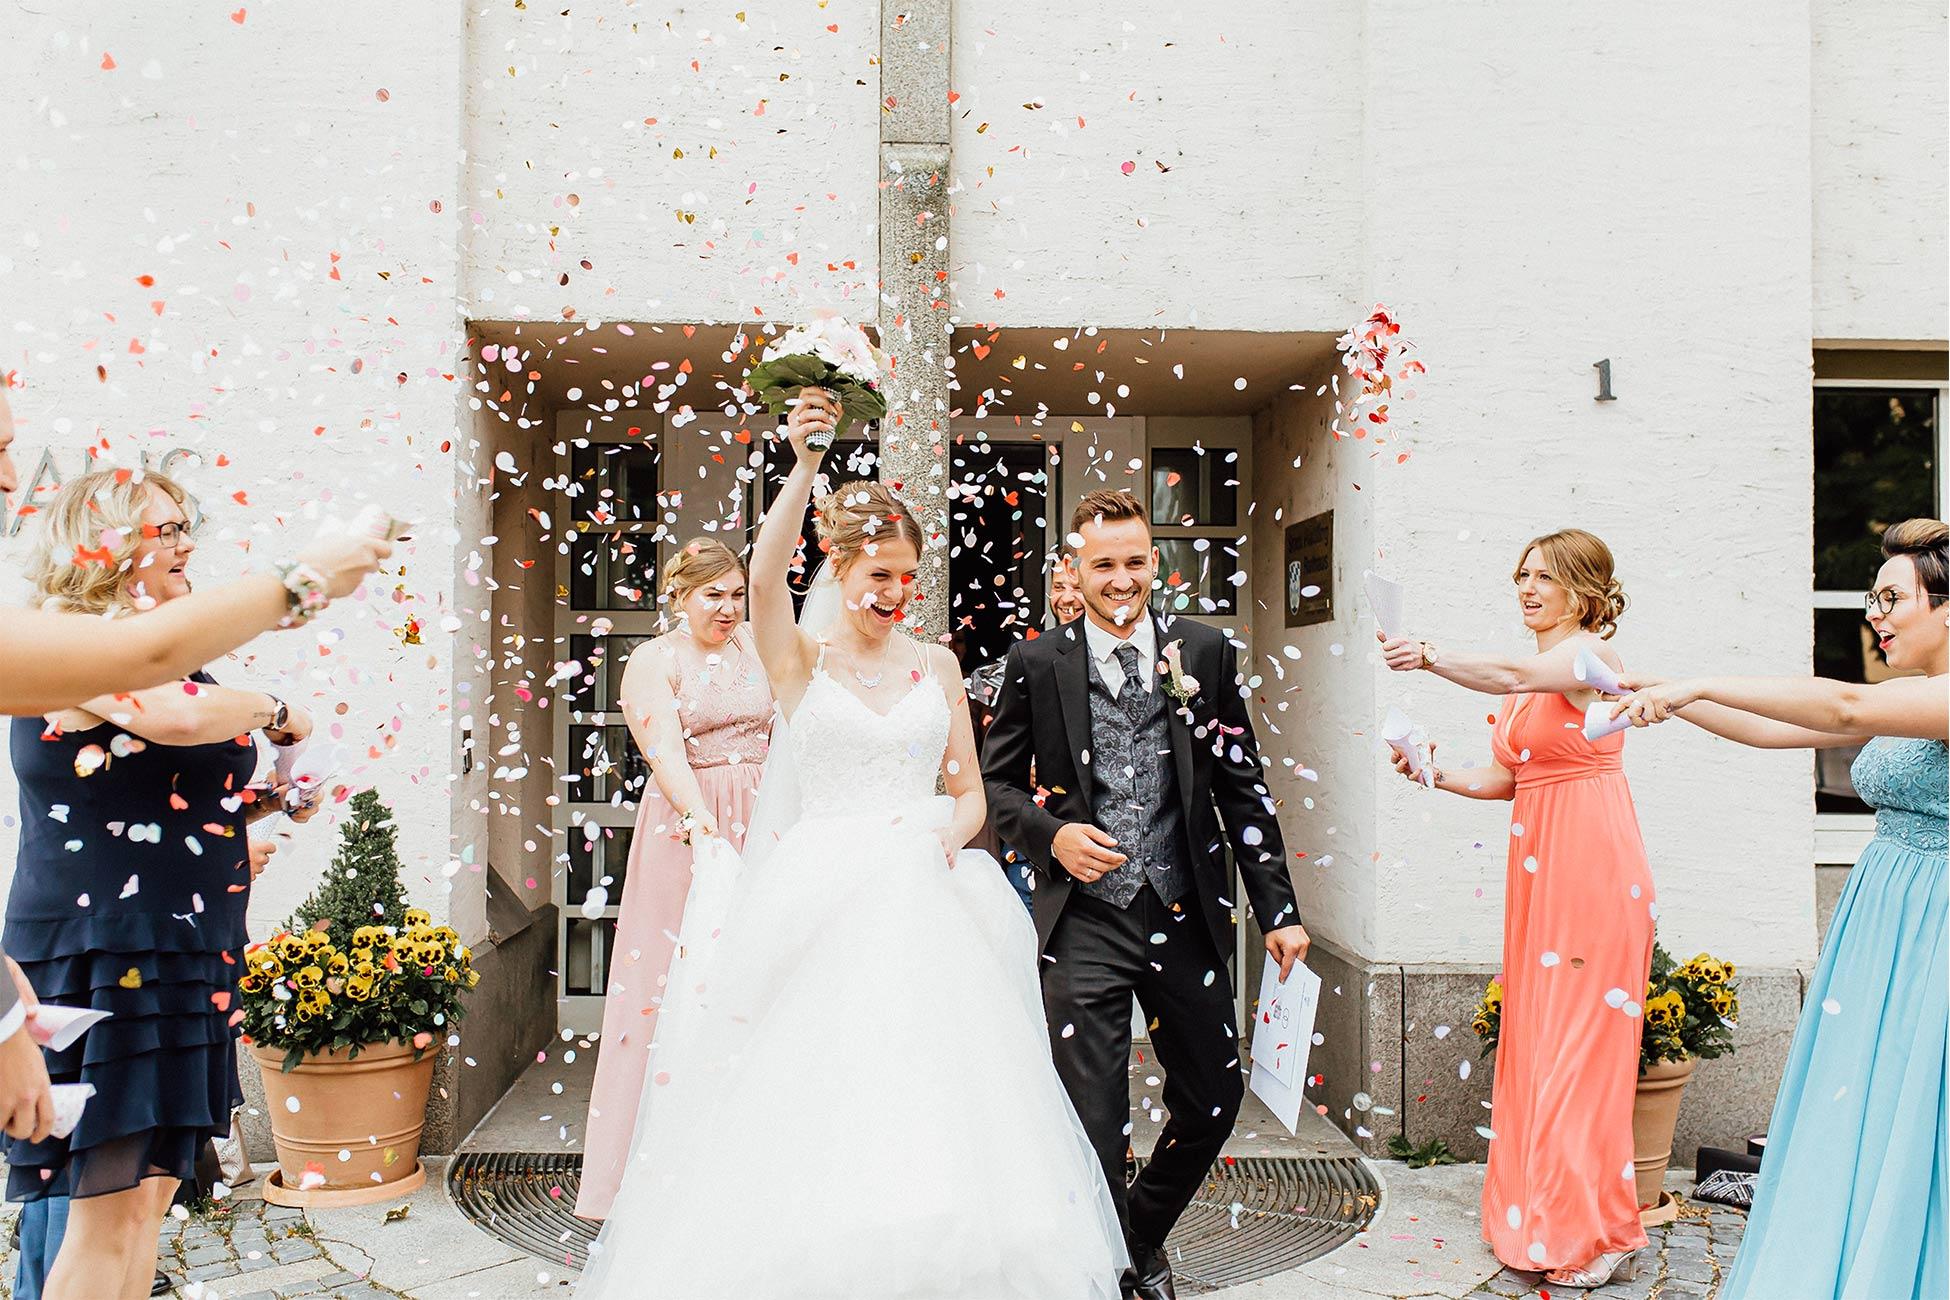 Donaucenter Schubert Osterhofen Hochzeit